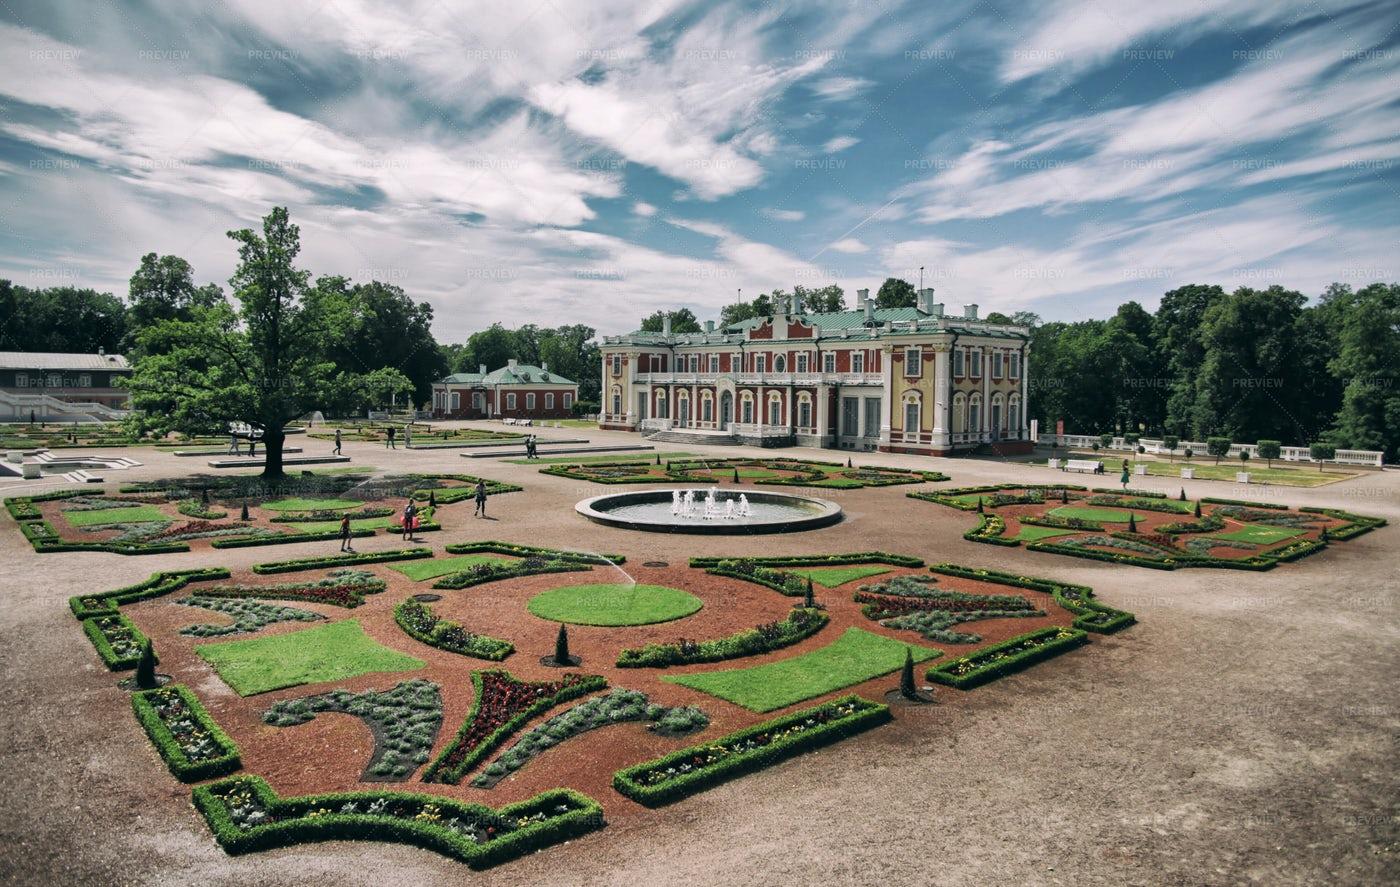 Kadriorg Palace, Tallinn: Stock Photos